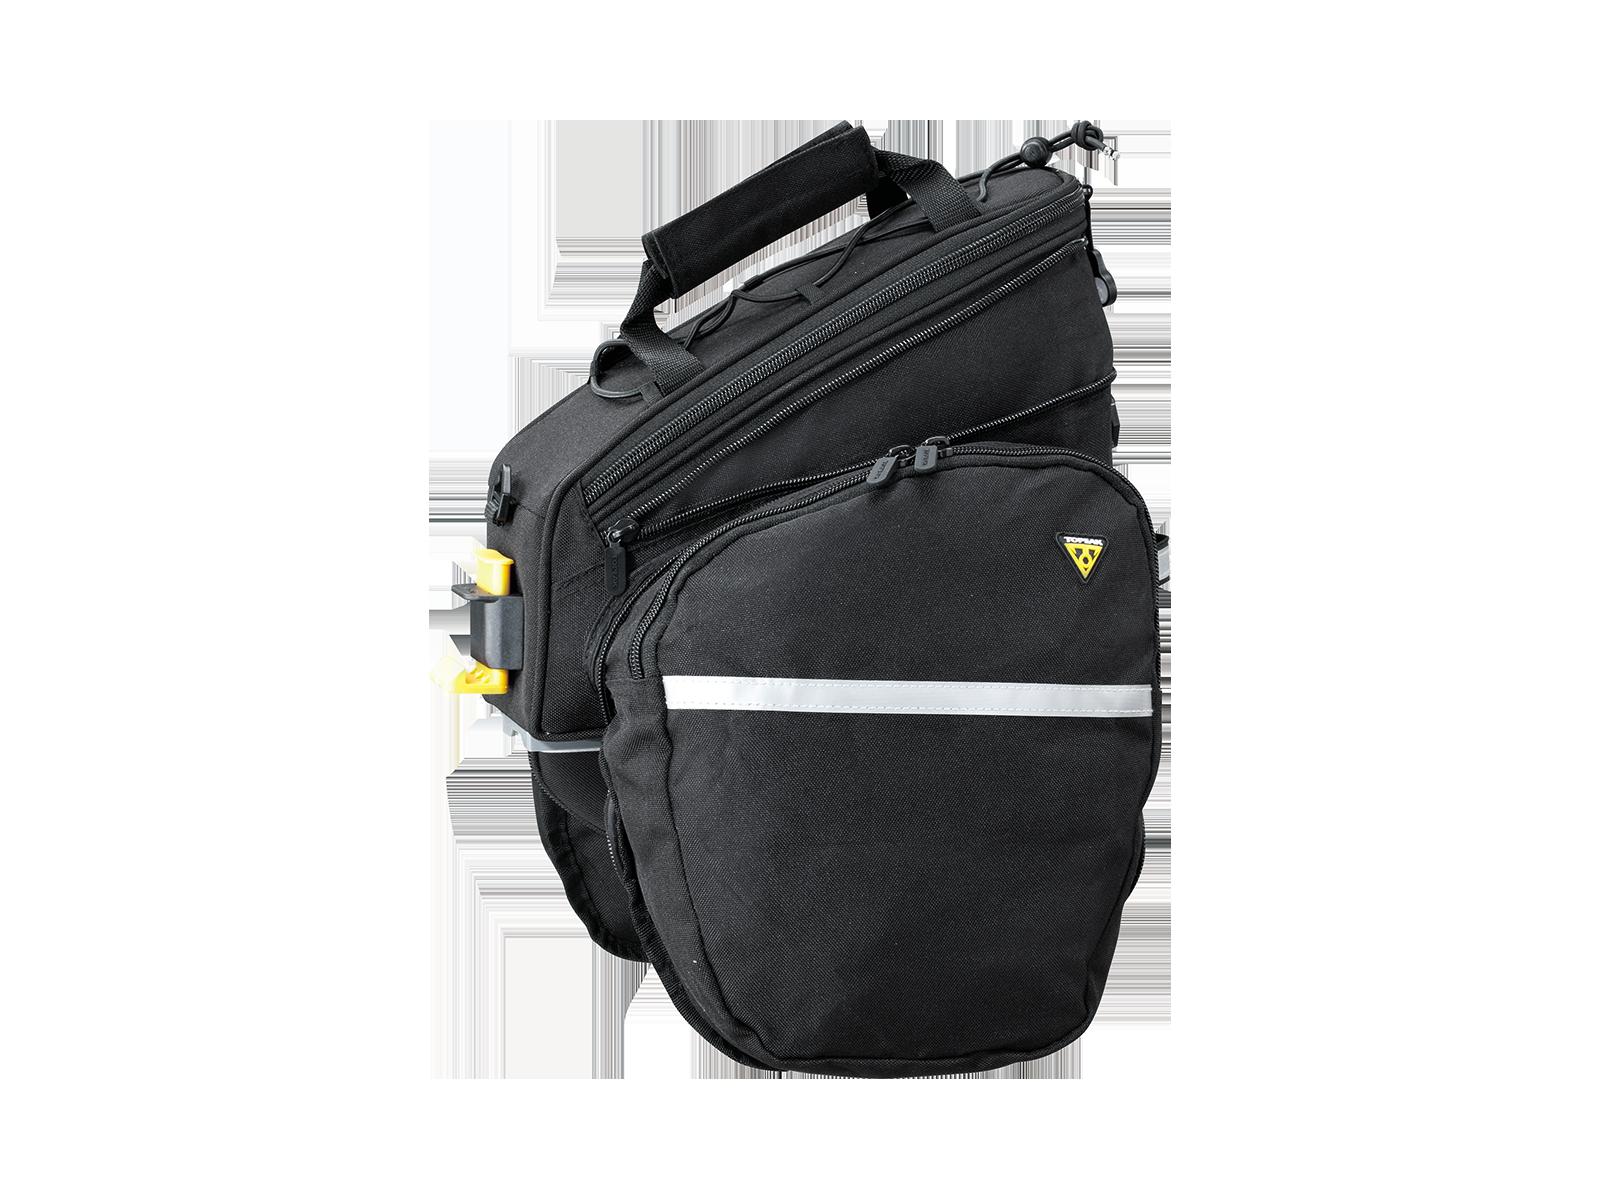 Topeak RX Trunkbag DXP Gepäckträgertasche